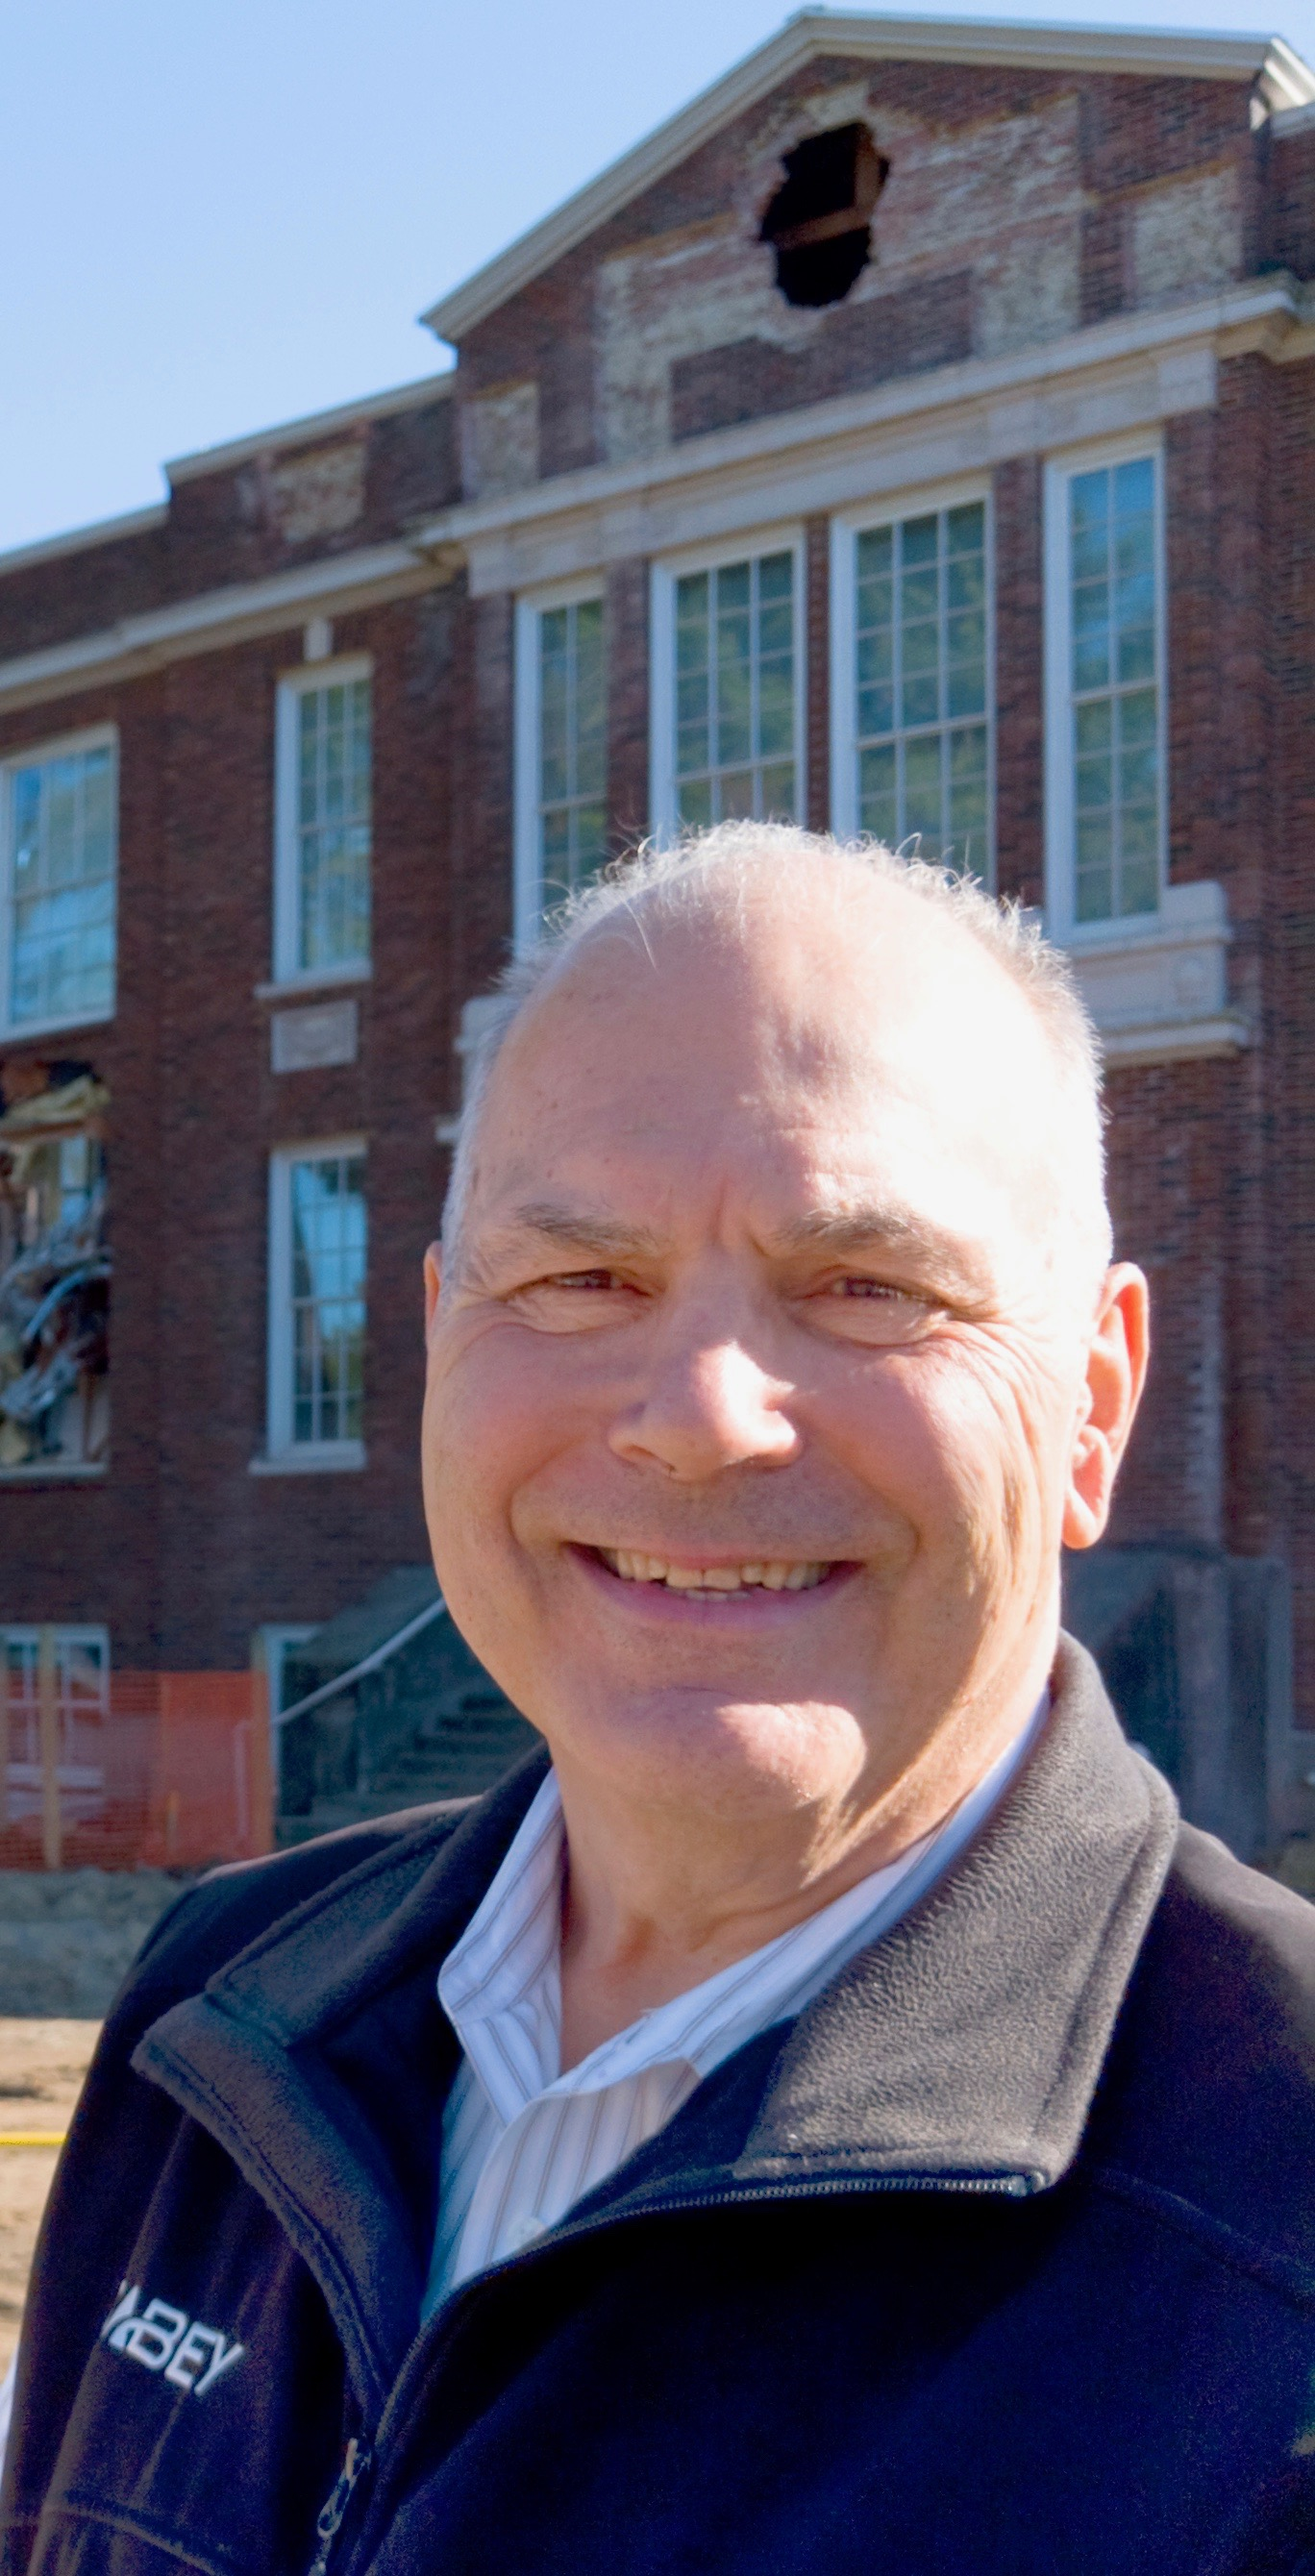 Highline Grad David Sabey Reminisces About His School Days